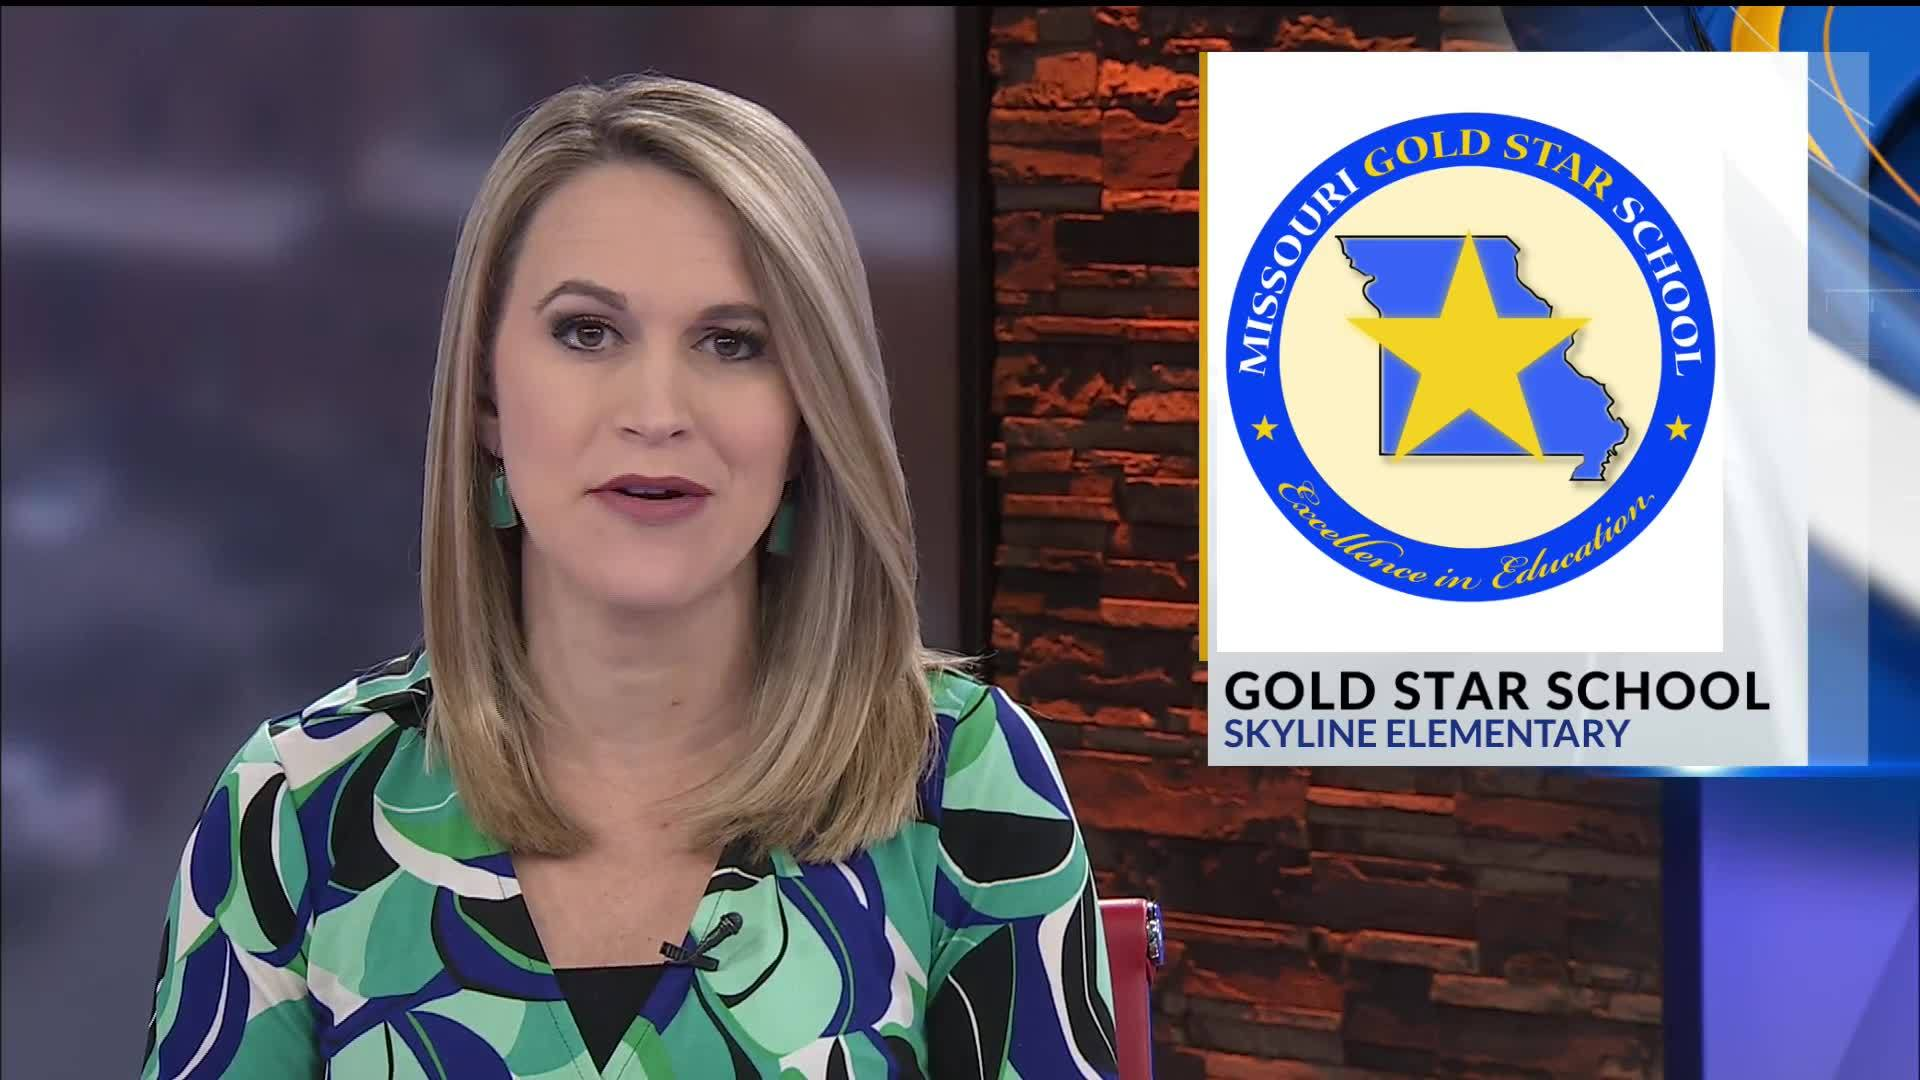 Gold_star_school_recognized_3_20190617223629